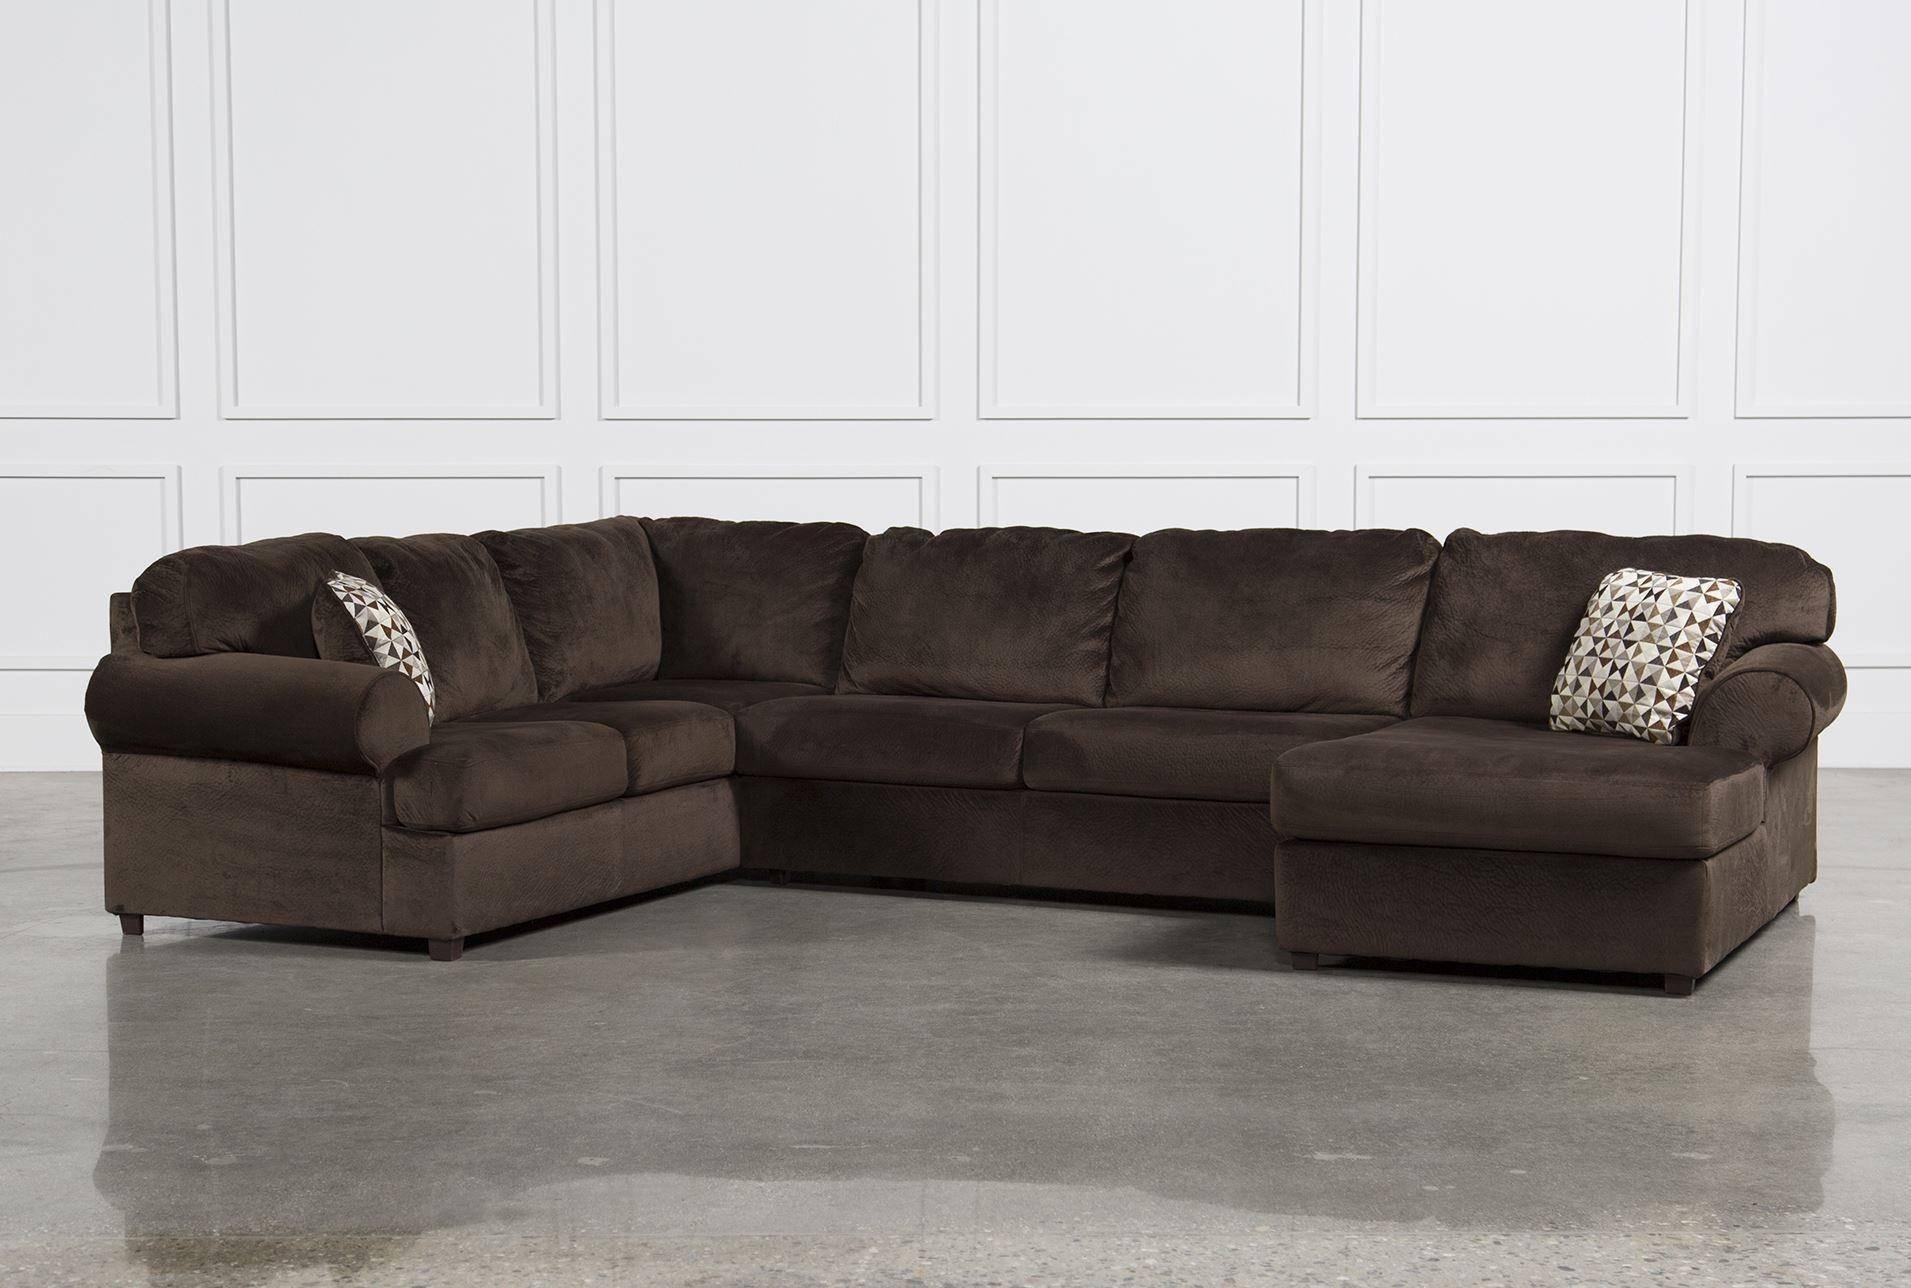 20 Inspirations Sealy Sofas | Sofa Ideas regarding Sealy Sofas (Image 5 of 15)